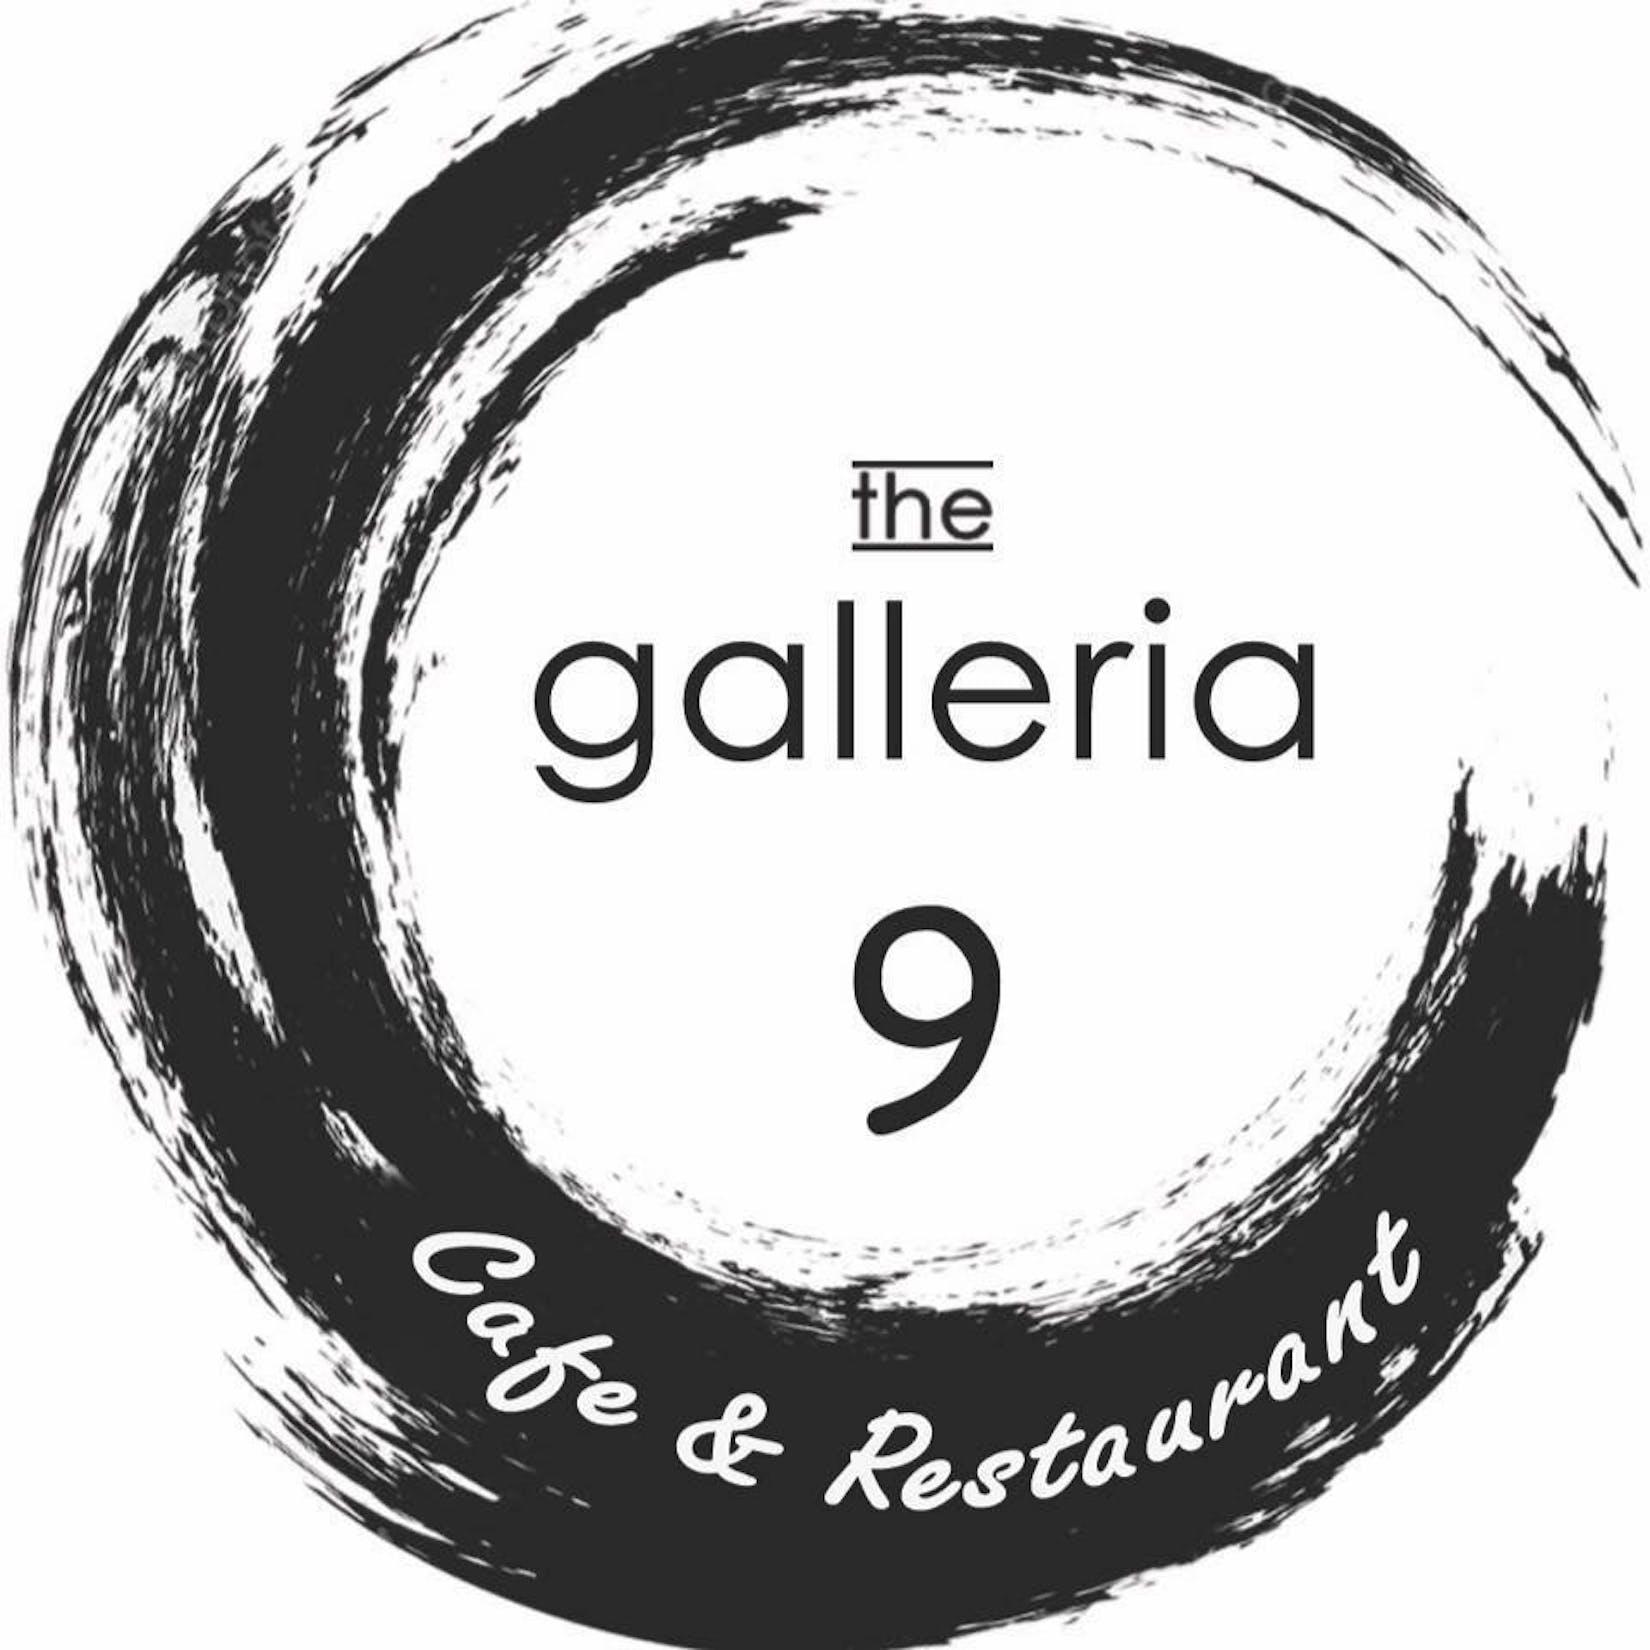 The galleria 9 cafe & restaurant | yathar